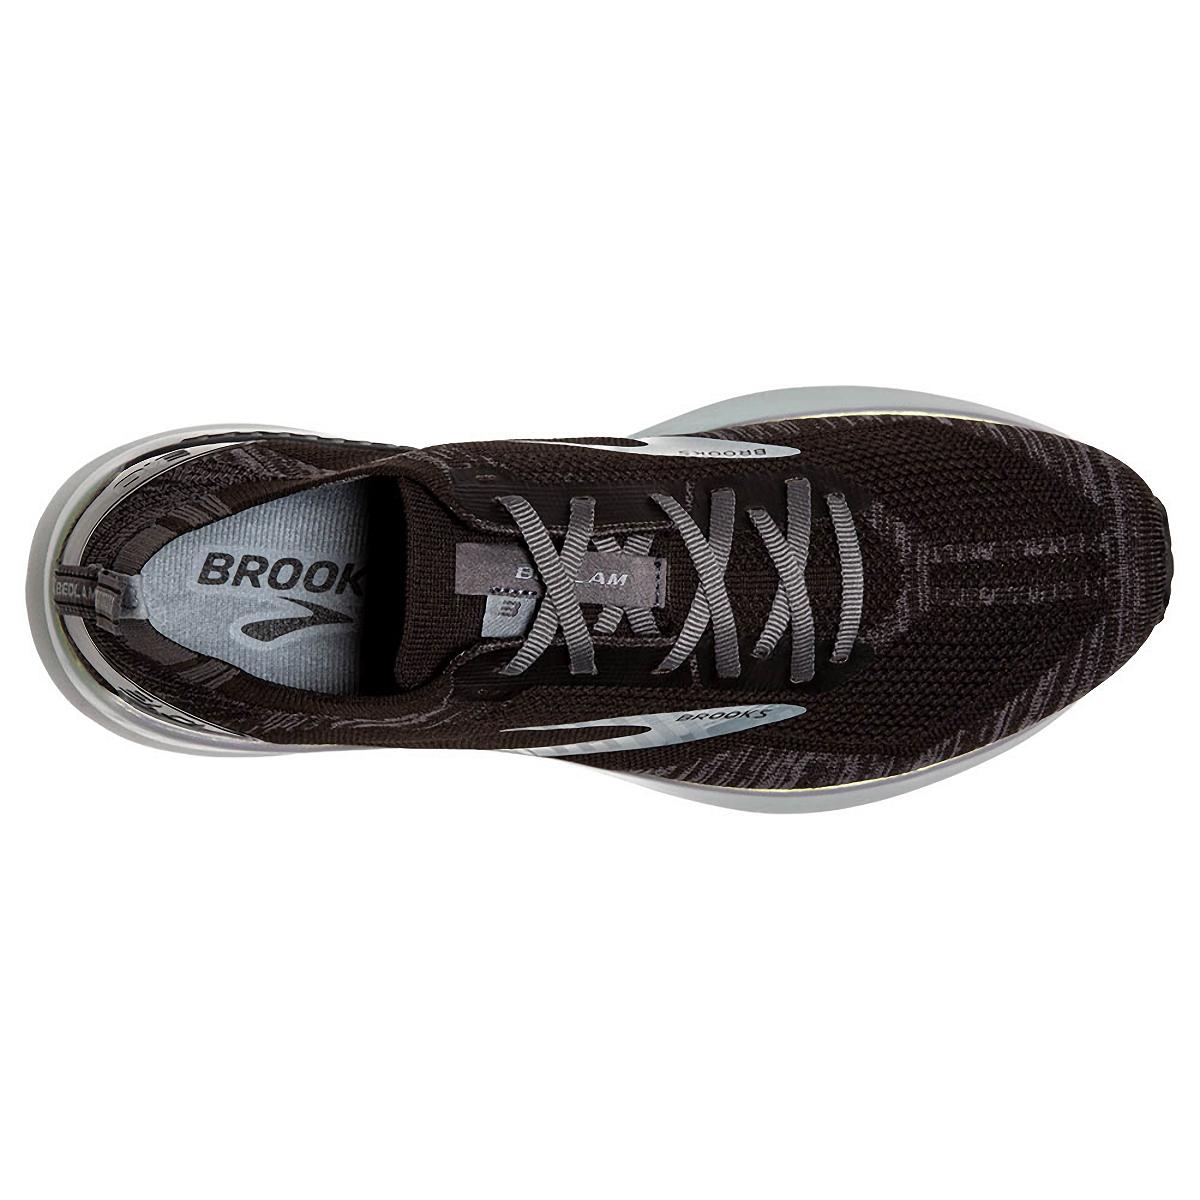 Men's Brooks Bedlam 3 Running Shoe - Color: Black/Blackened - Size: 8.5 - Width: Regular, Black/Blackened, large, image 5